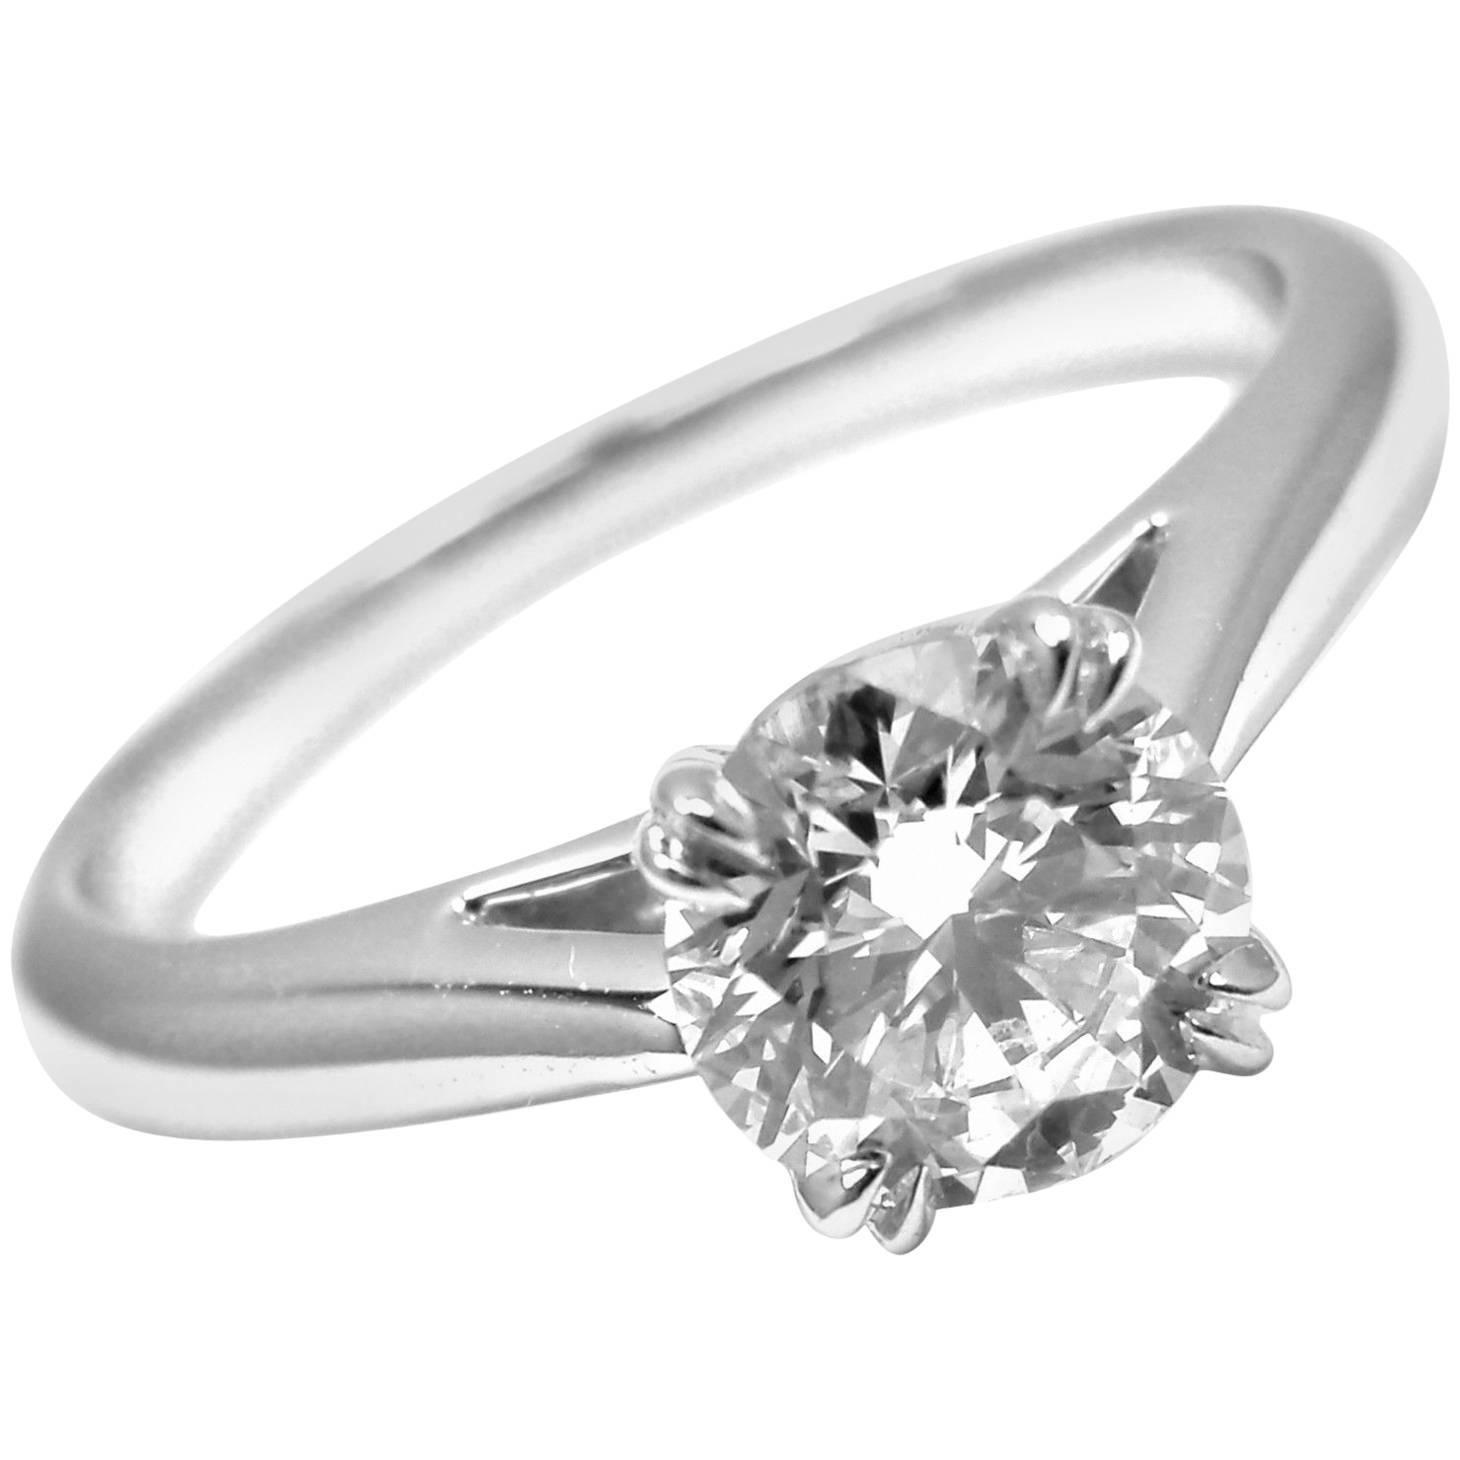 Harry Winston .56 Carat VVS1/F Diamond Solitaire Platinum Engagement Ring